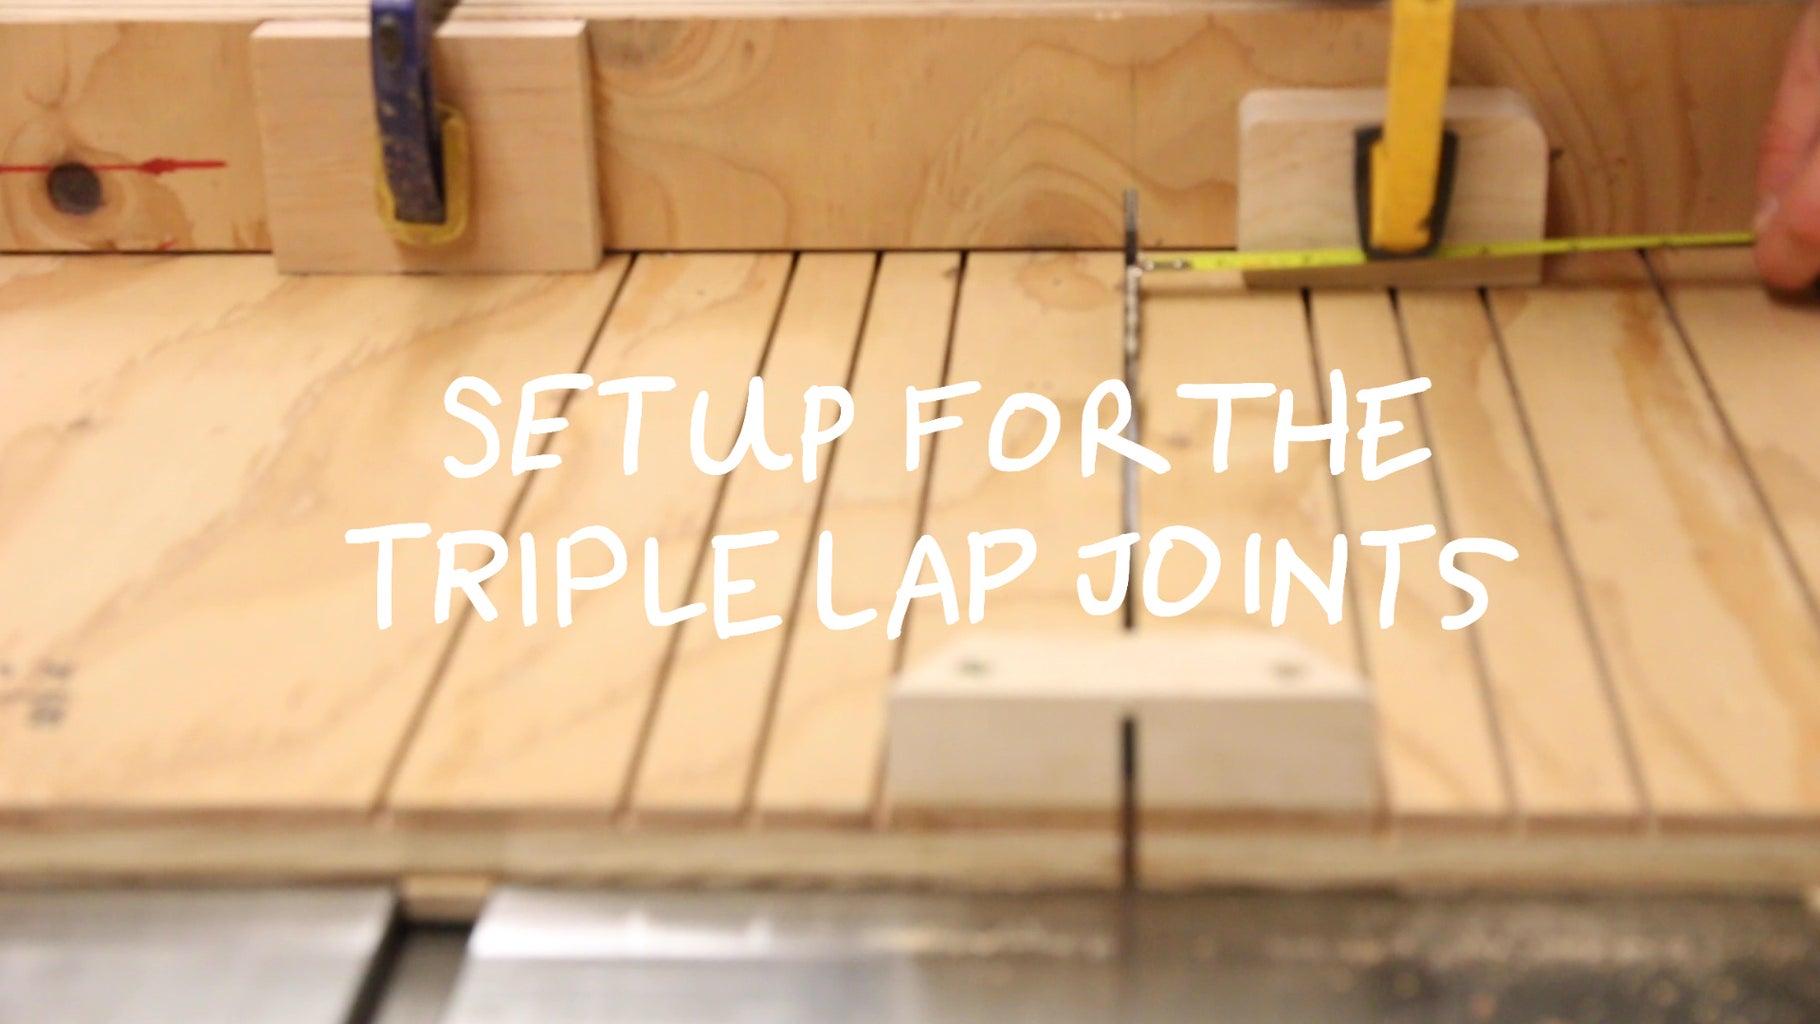 Cut the Cross-Lap Joinery